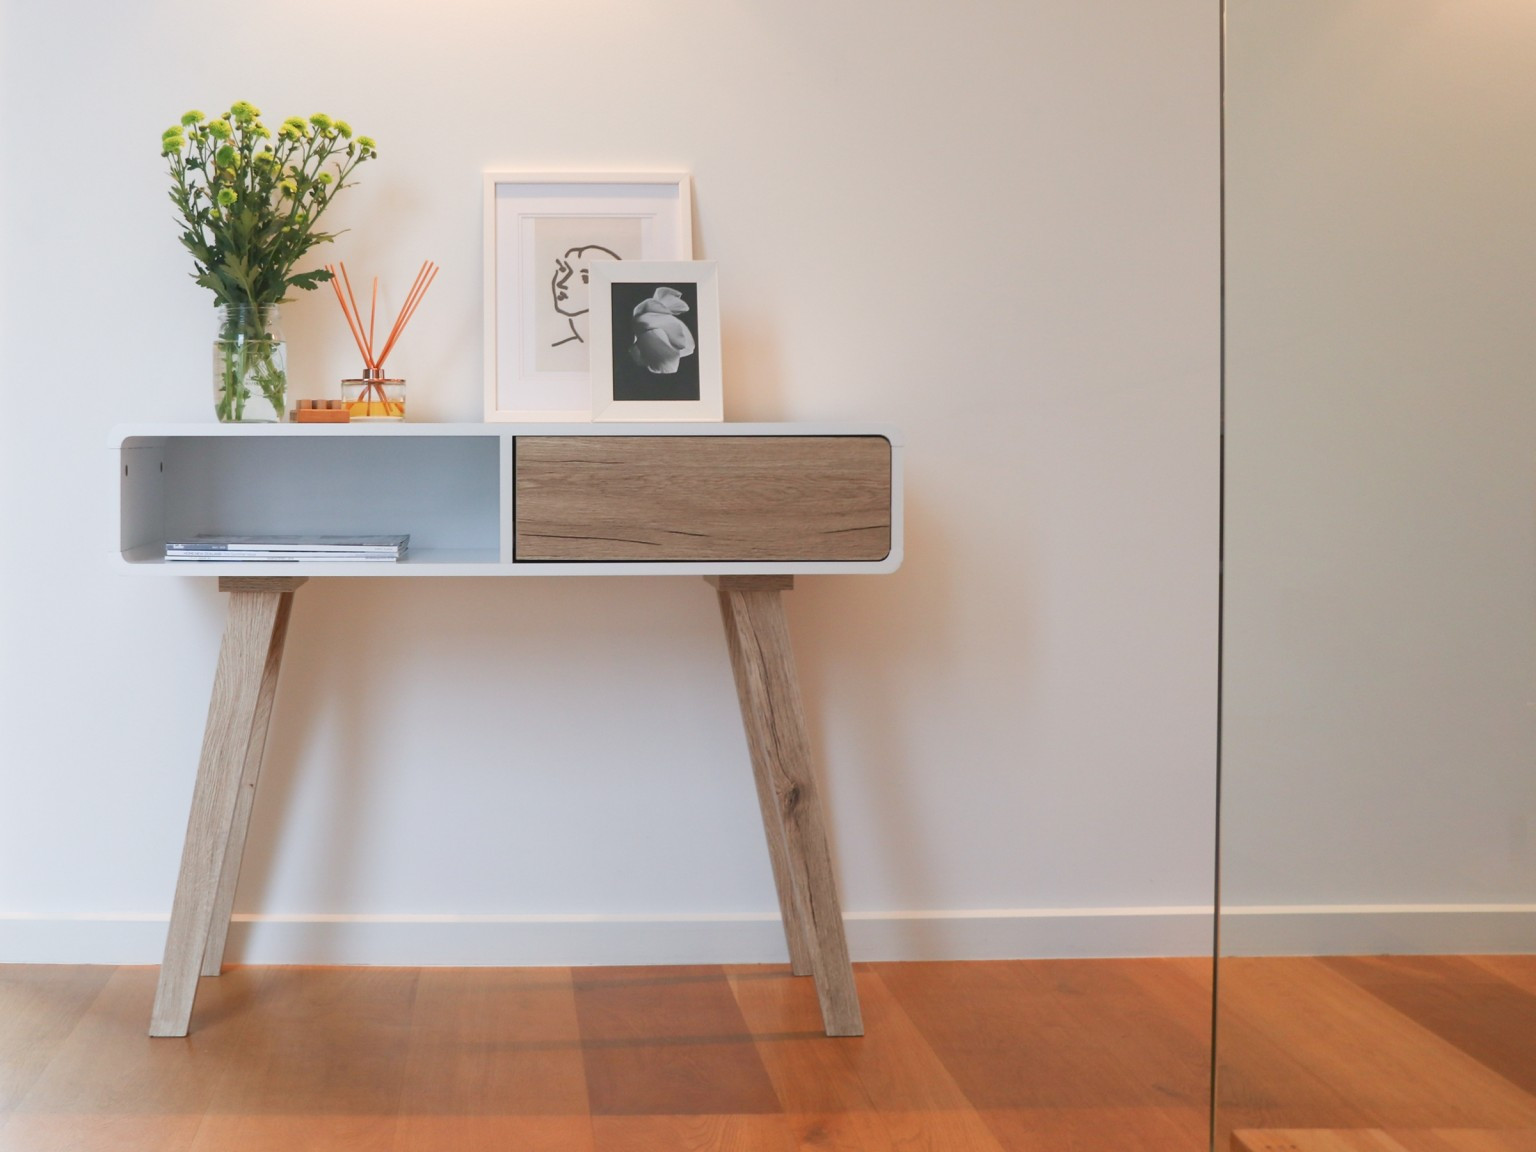 large floor vase nz of kennedy console living furniture mocka nz regarding kennedy console